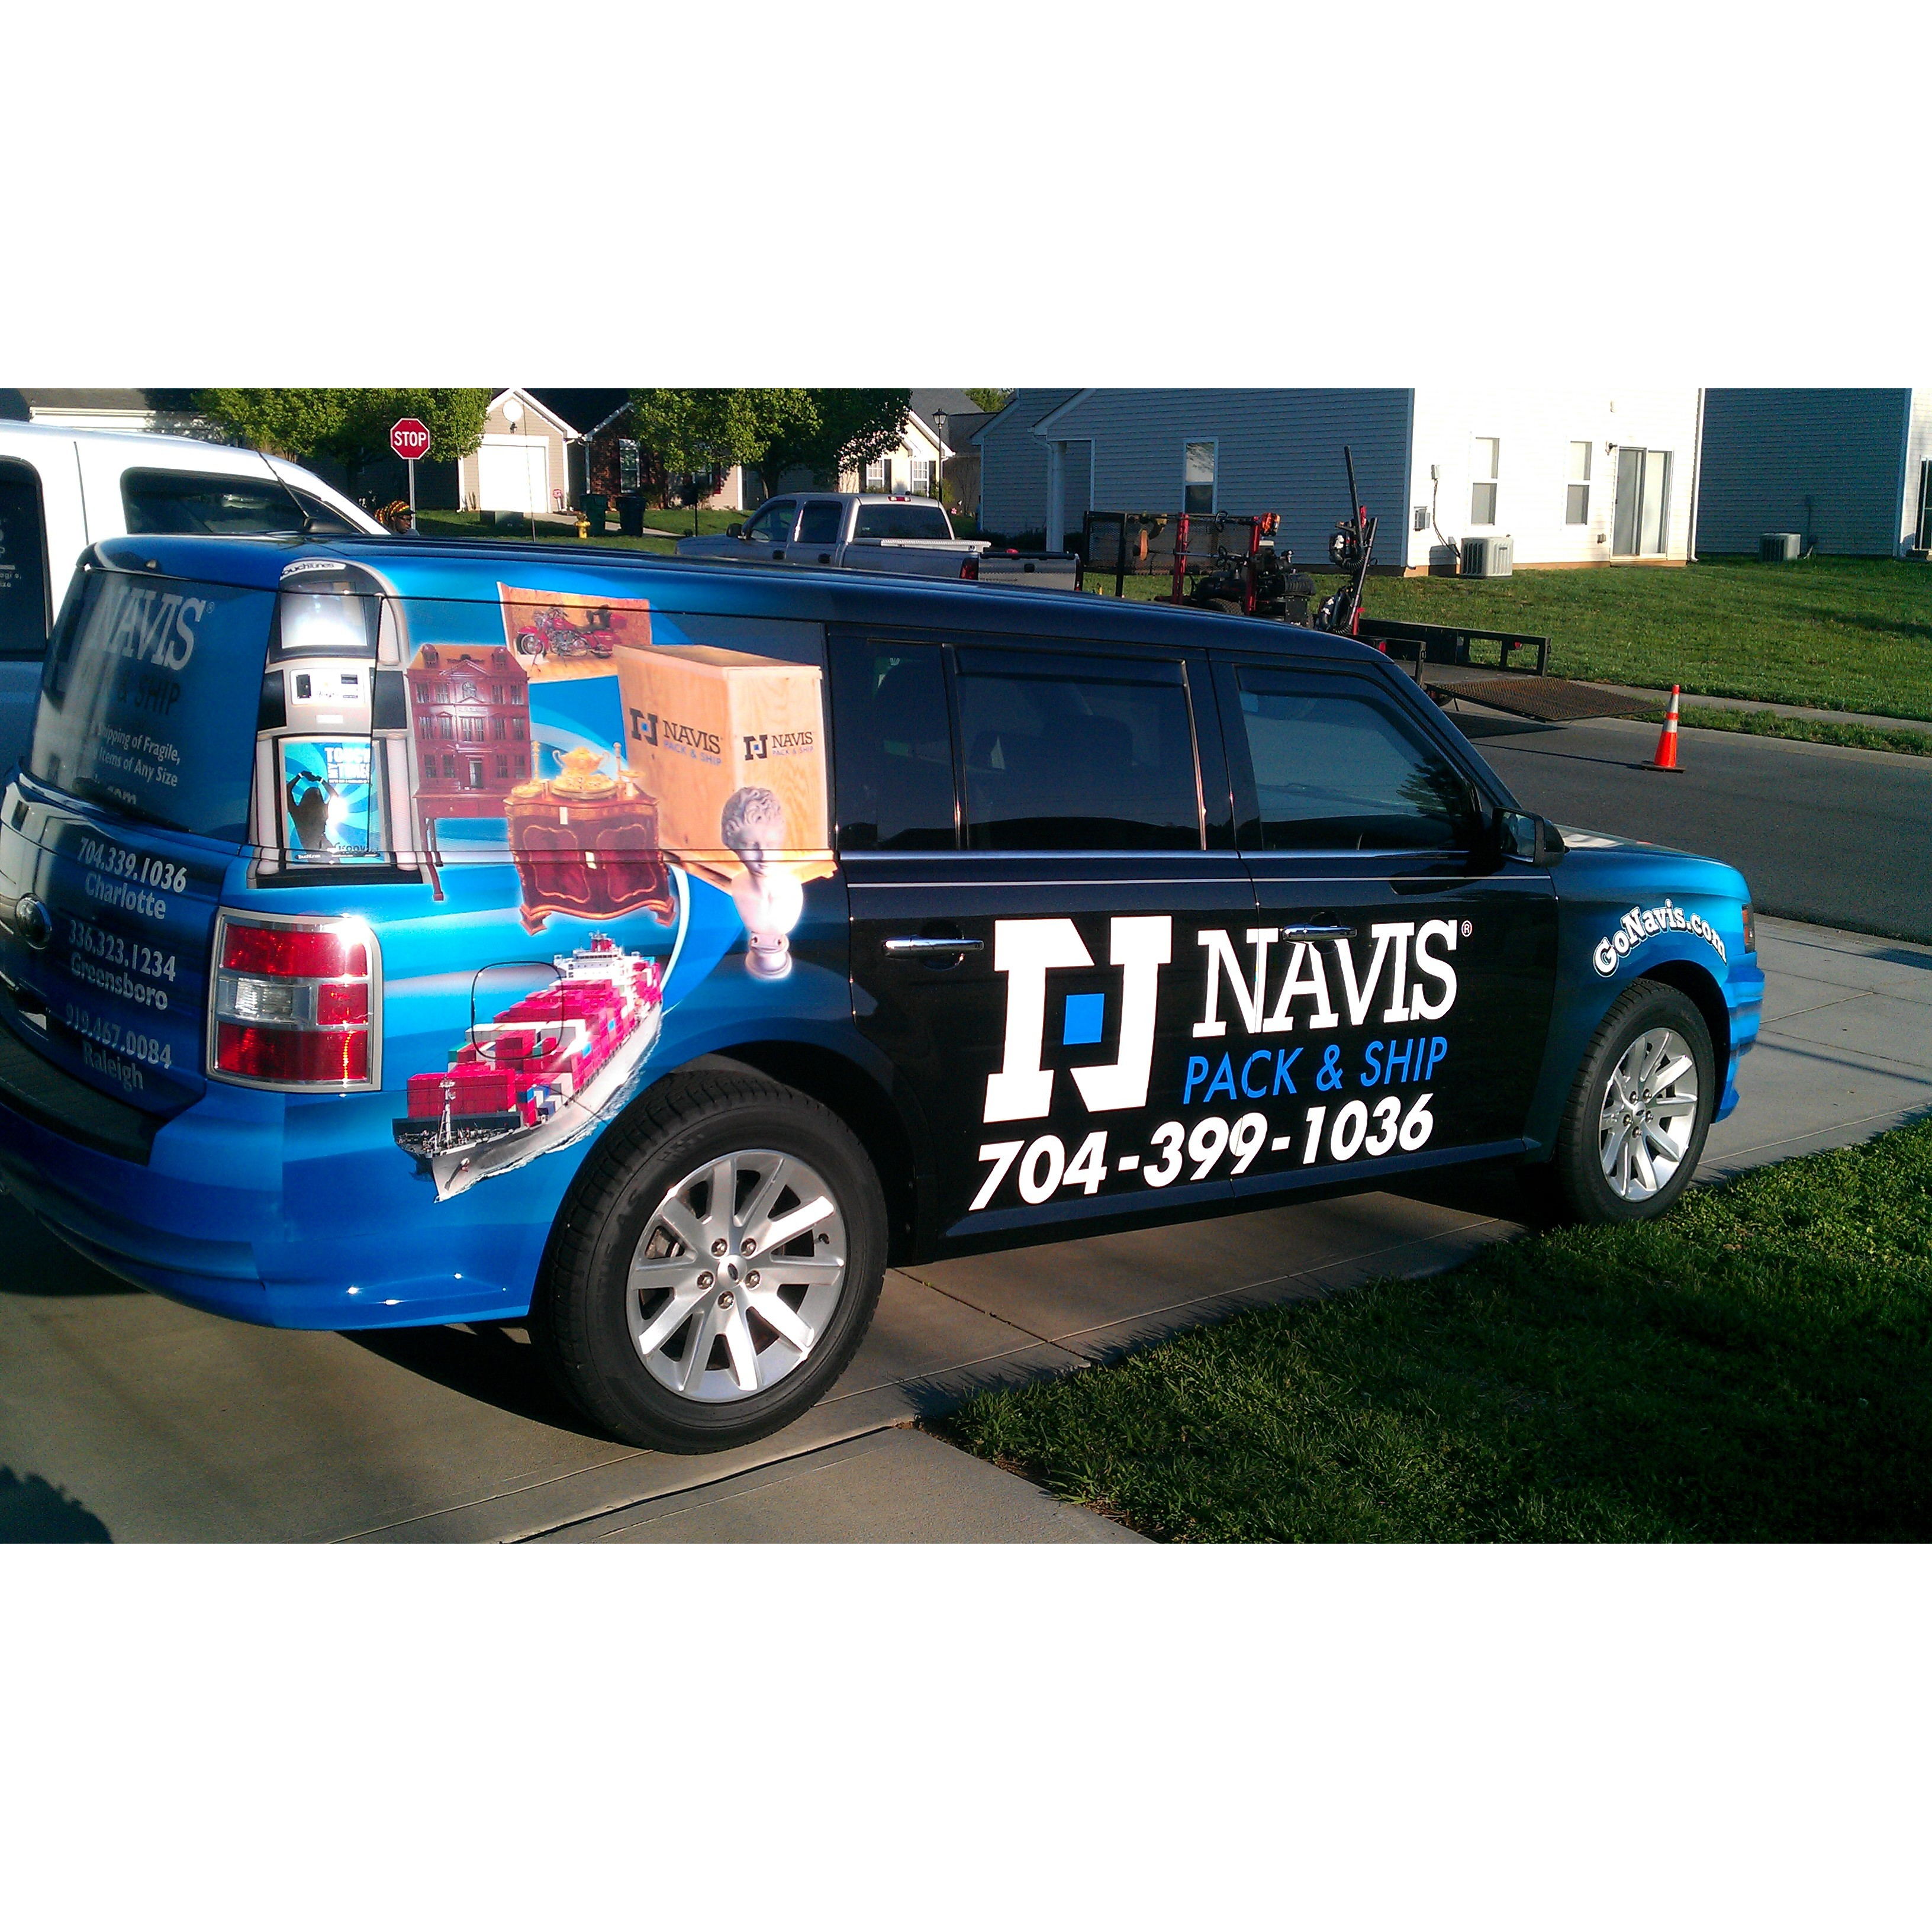 Navis Pack & Ship - ad image